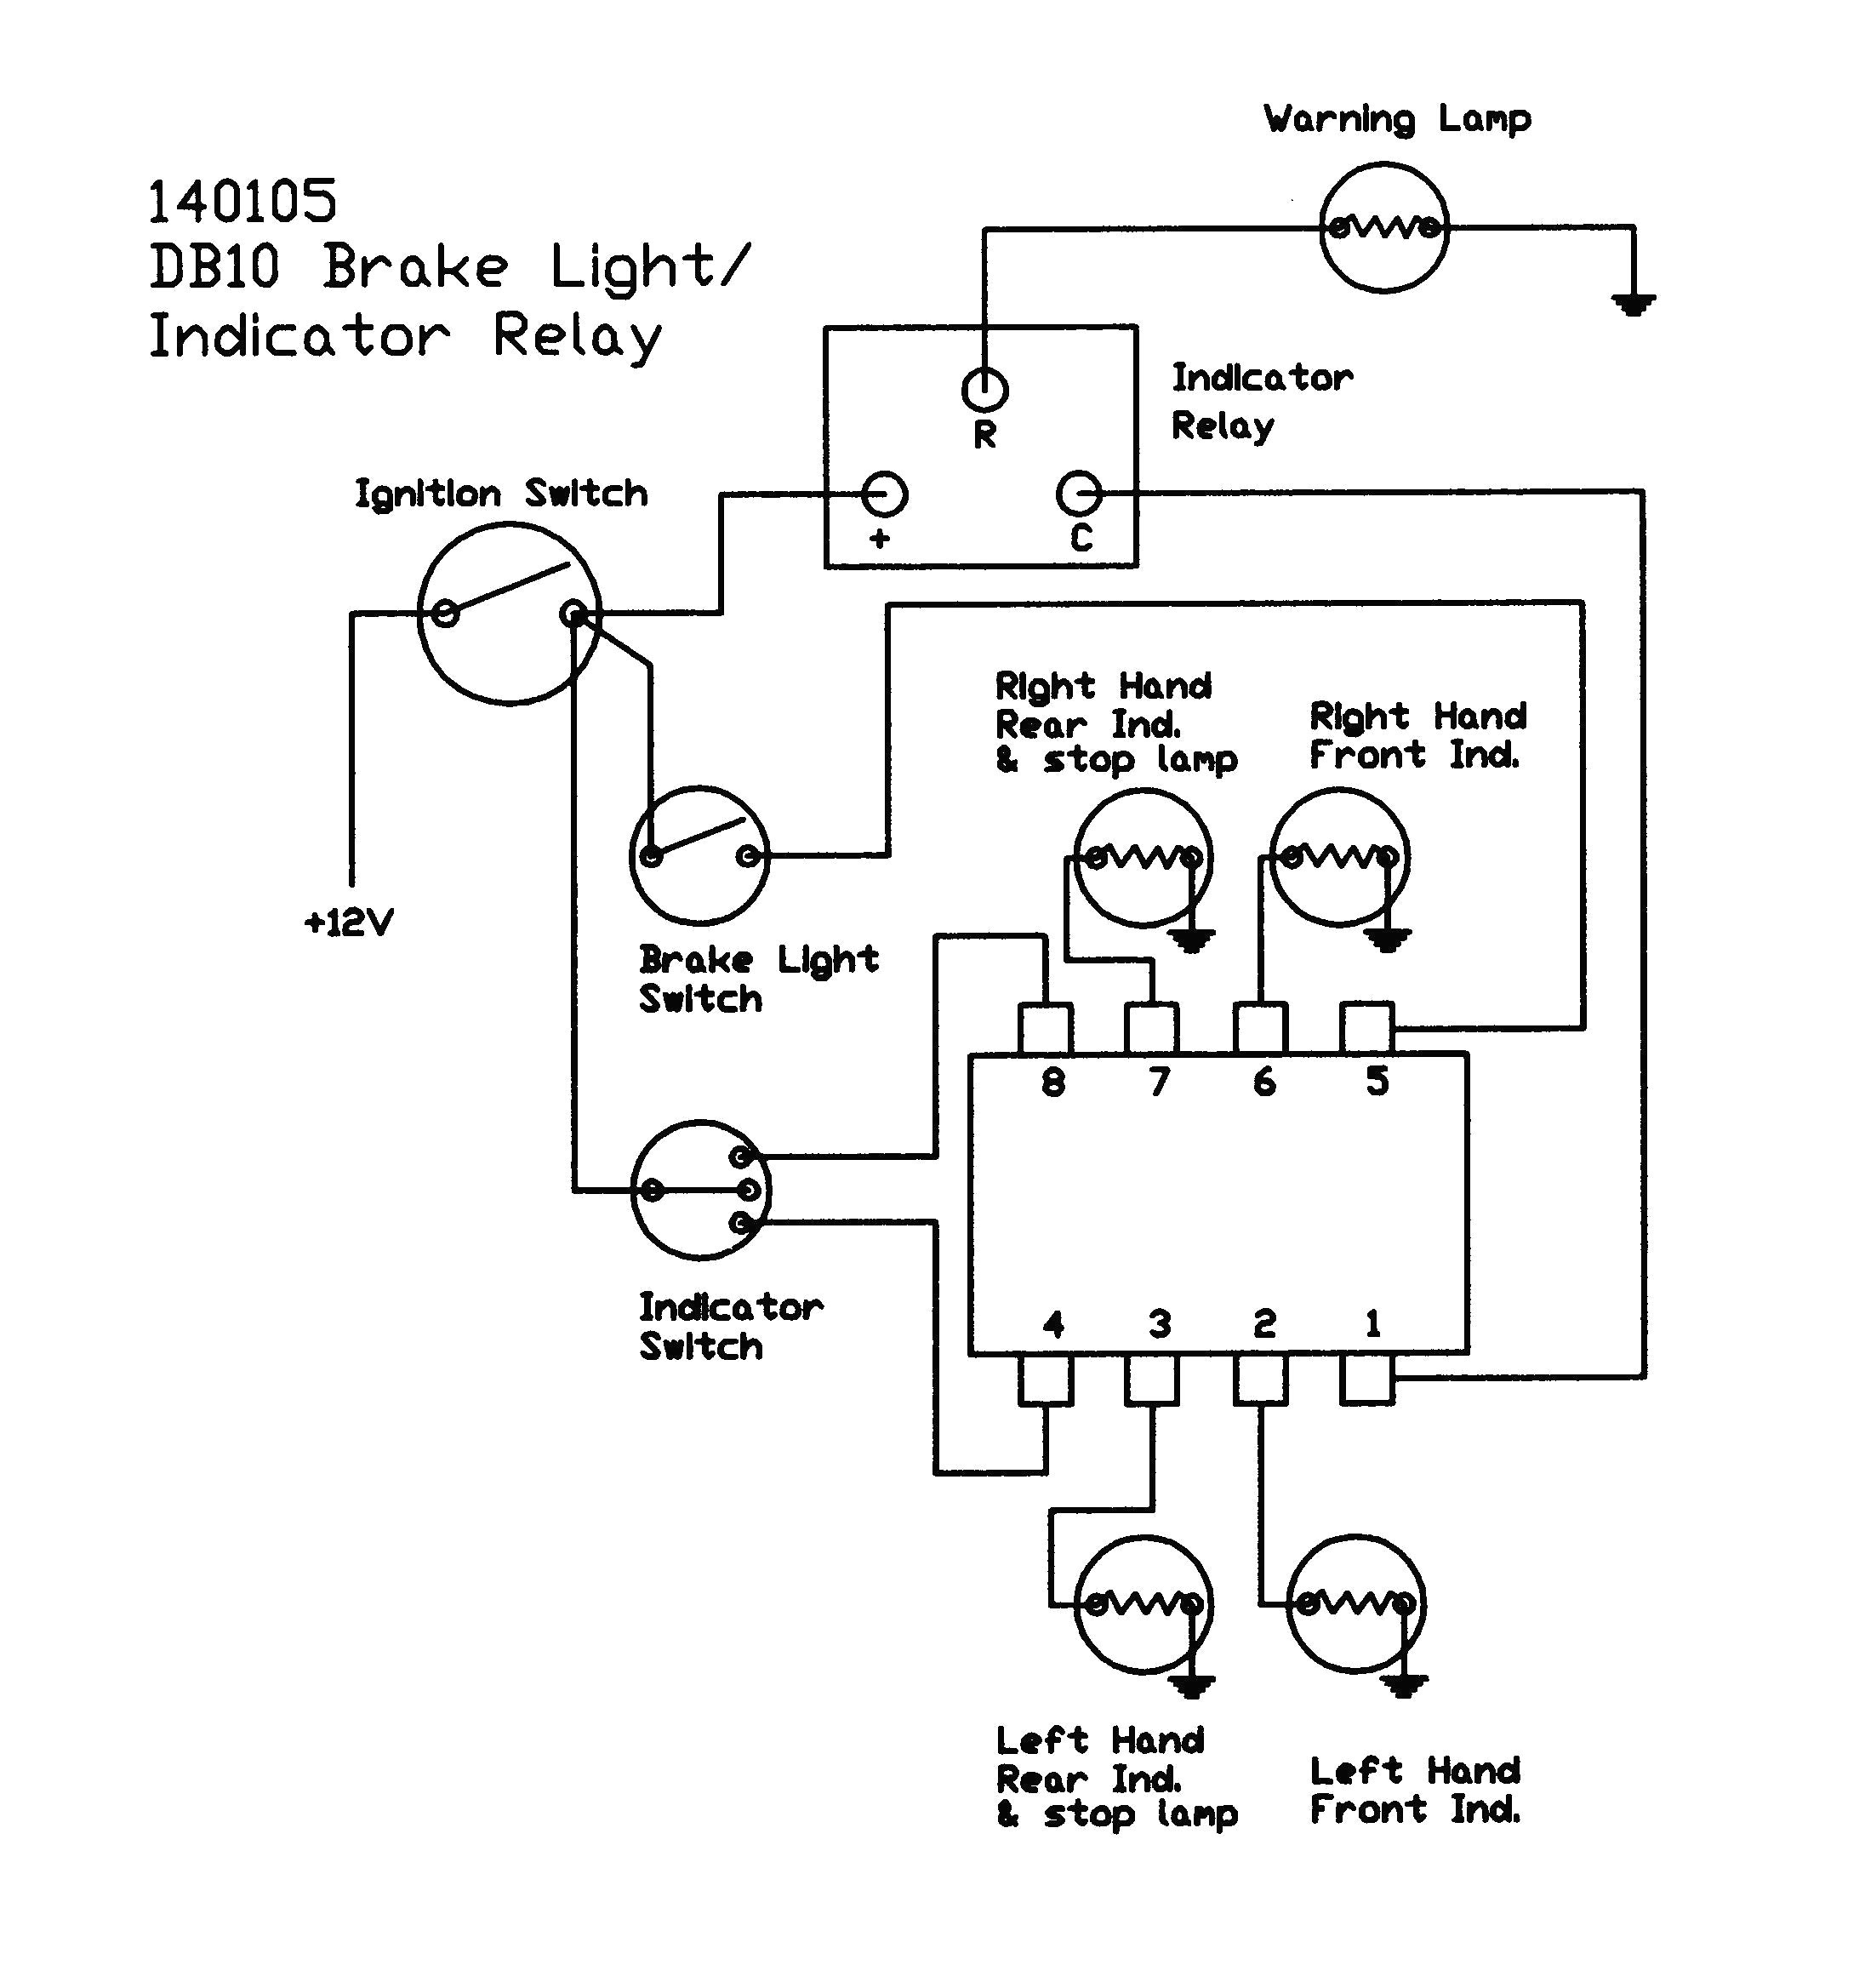 Chevy Hei Wiring | Wiring Library - Sbc Starter Wiring Diagram